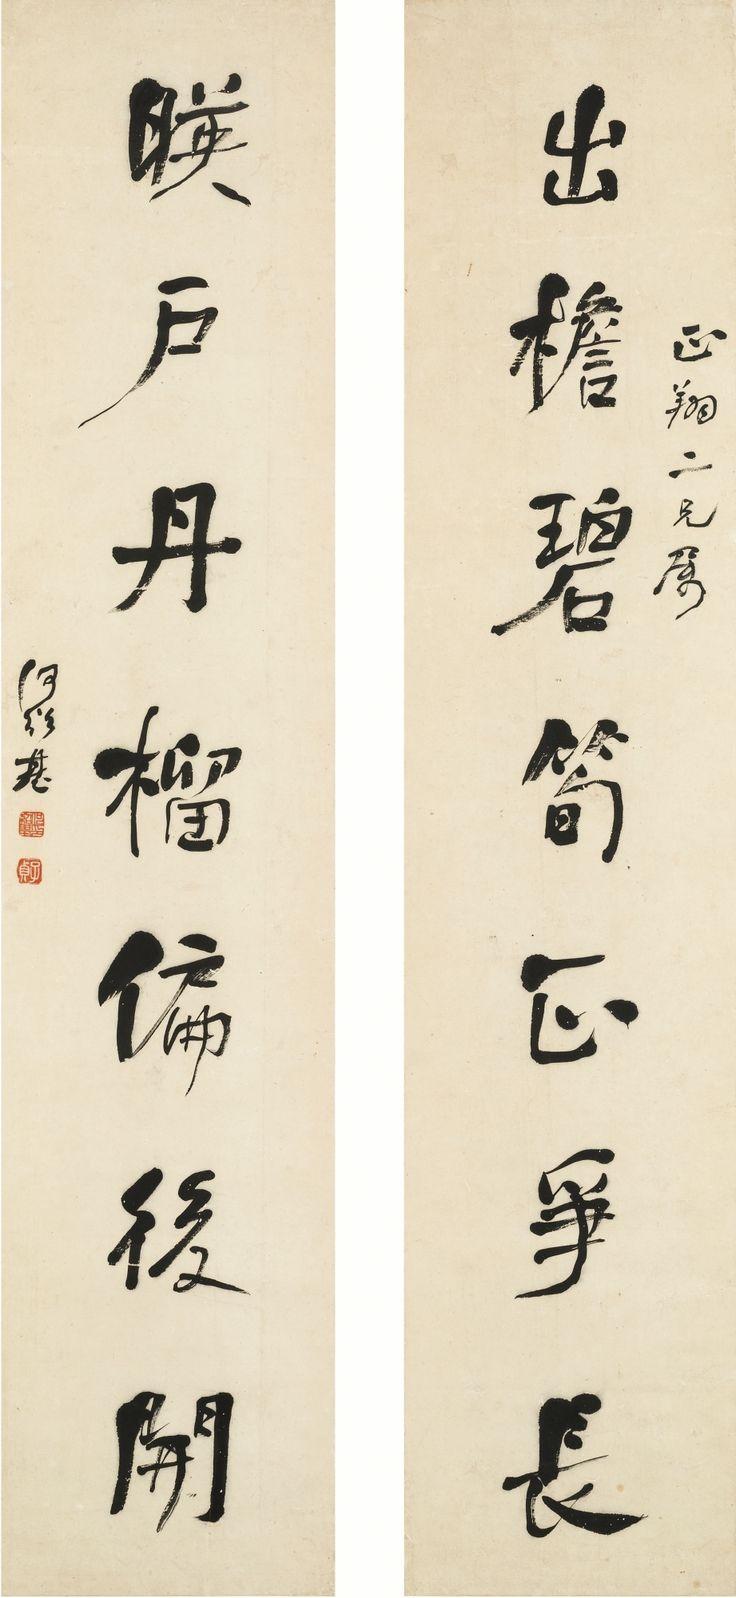 He Shaoji (1799-1873) CALLIGRAPHY COUPLET IN XINGSHU. 何紹基 (1799-1873)  行書七言聯 水墨紙本 立軸 款識: 出檐碧筍正爭長,暎戶丹榴偏後開。 正翔二兄屬。何紹基。  鈐印:「何紹基印」、「子貞」。 each 162 by 33.8 cm. 64 by 13 ¼ in. (2)